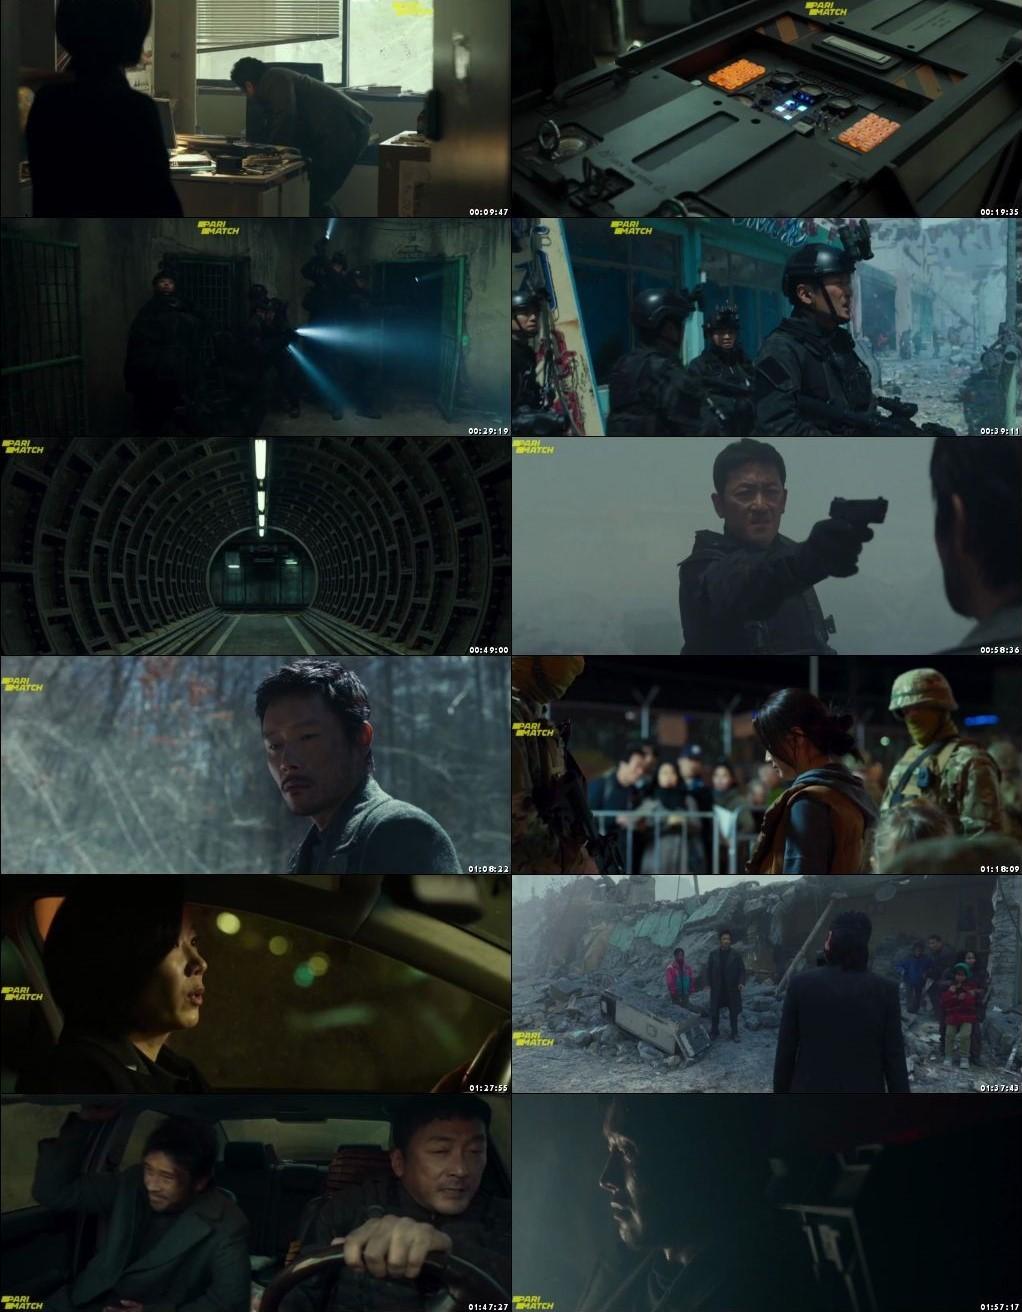 Ashfall 2019 Full Movie Online Watch